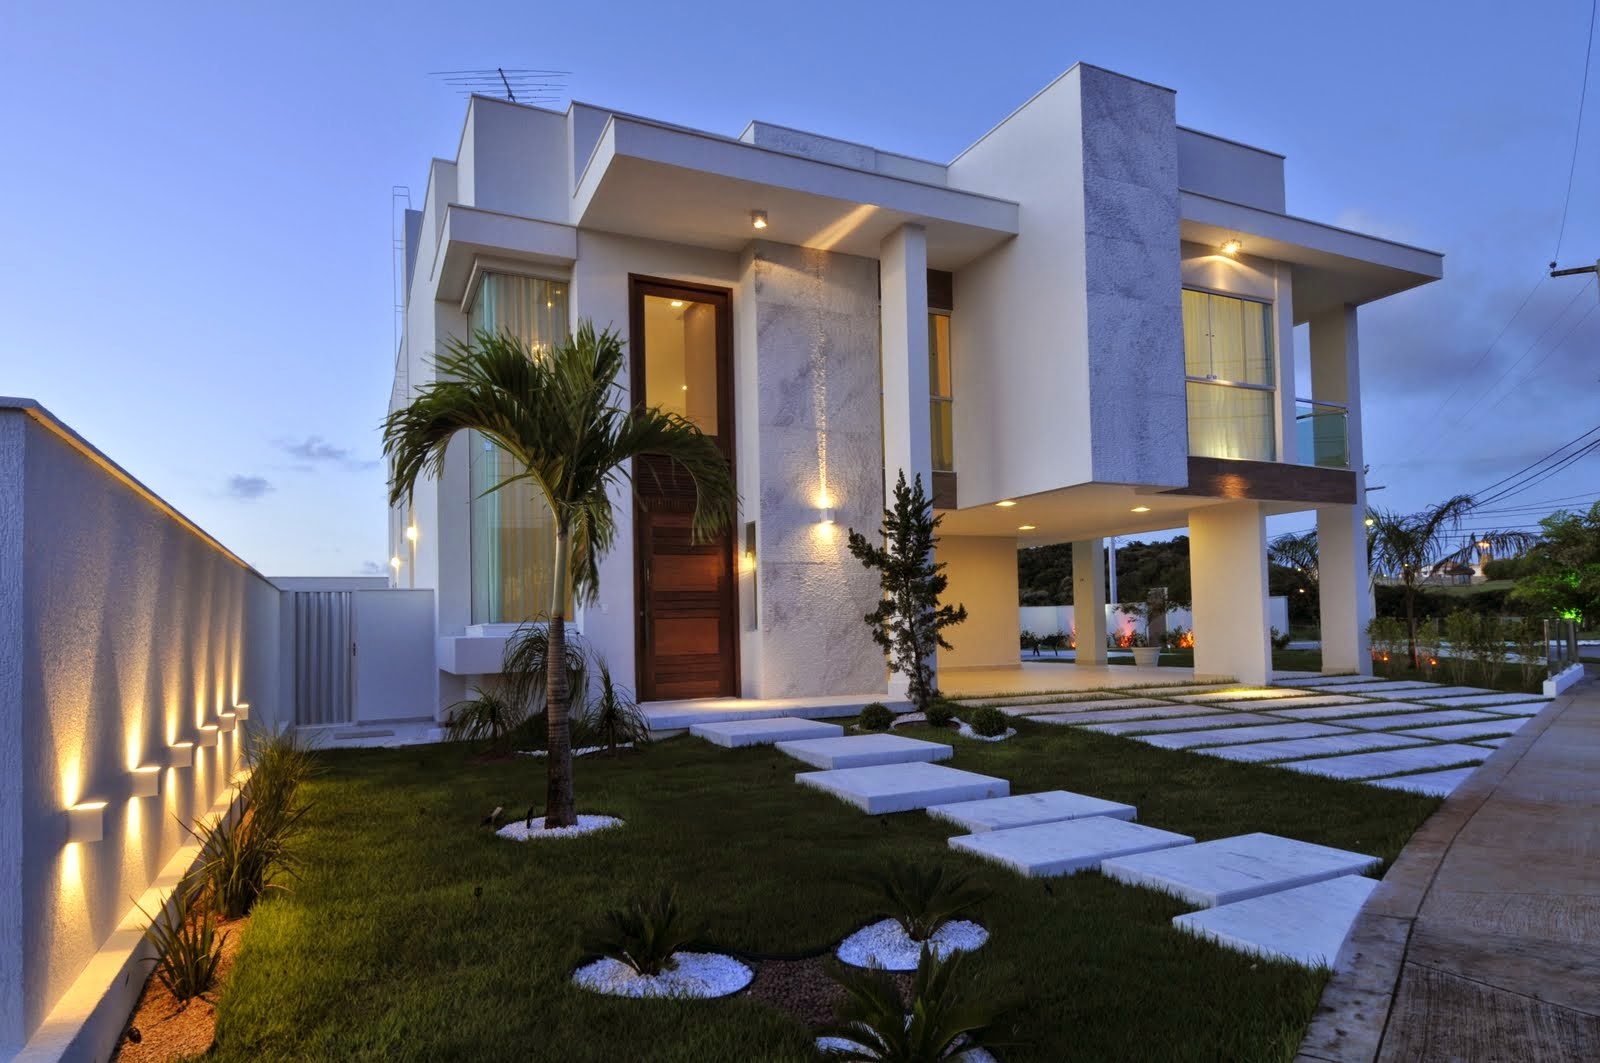 Fachadas modernas linhas retas e simplicidade celina for Fachada de casas modernas y bonitas